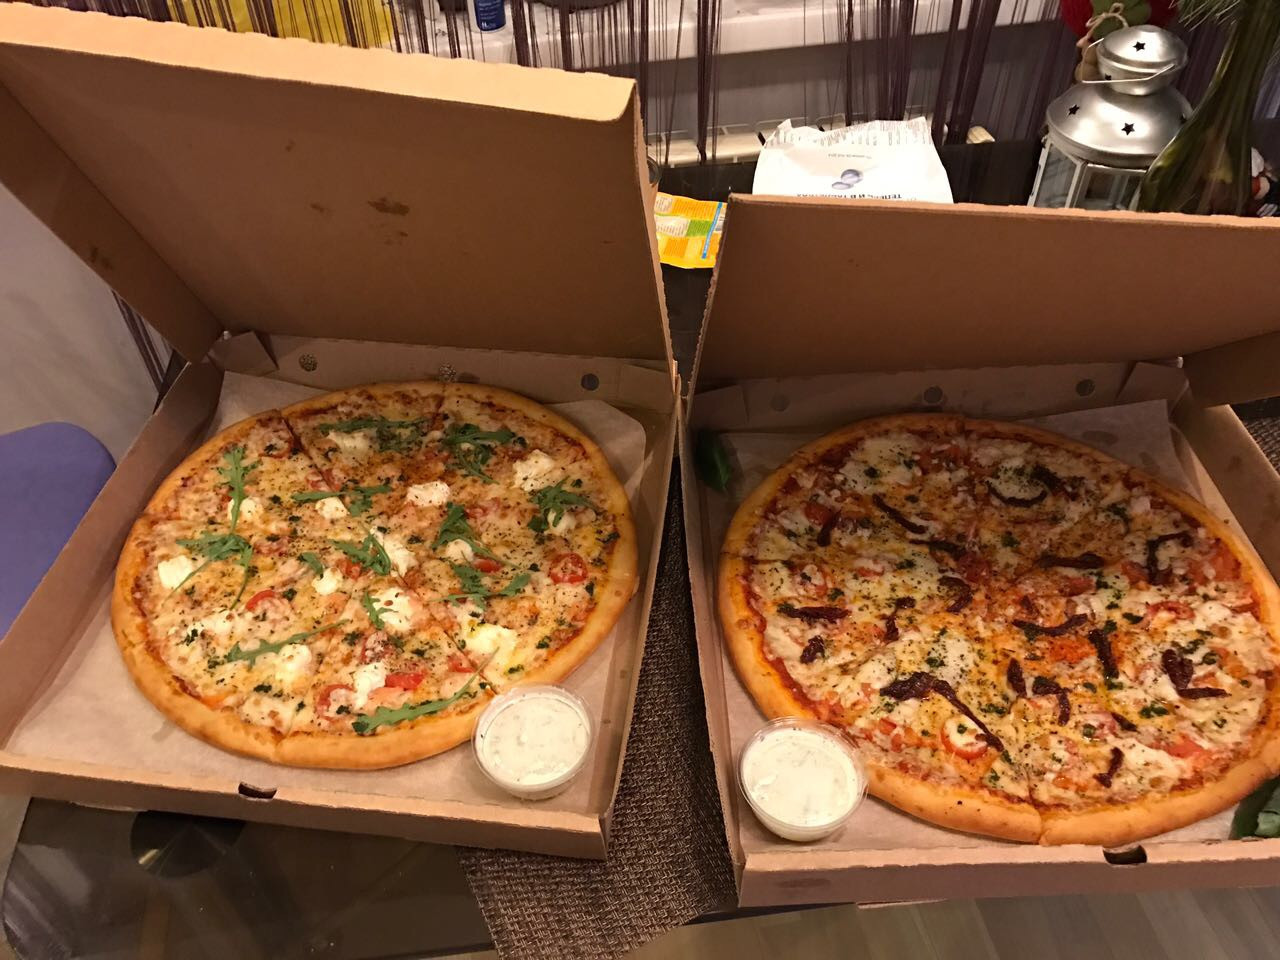 фото пиццы дома в коробке пчел